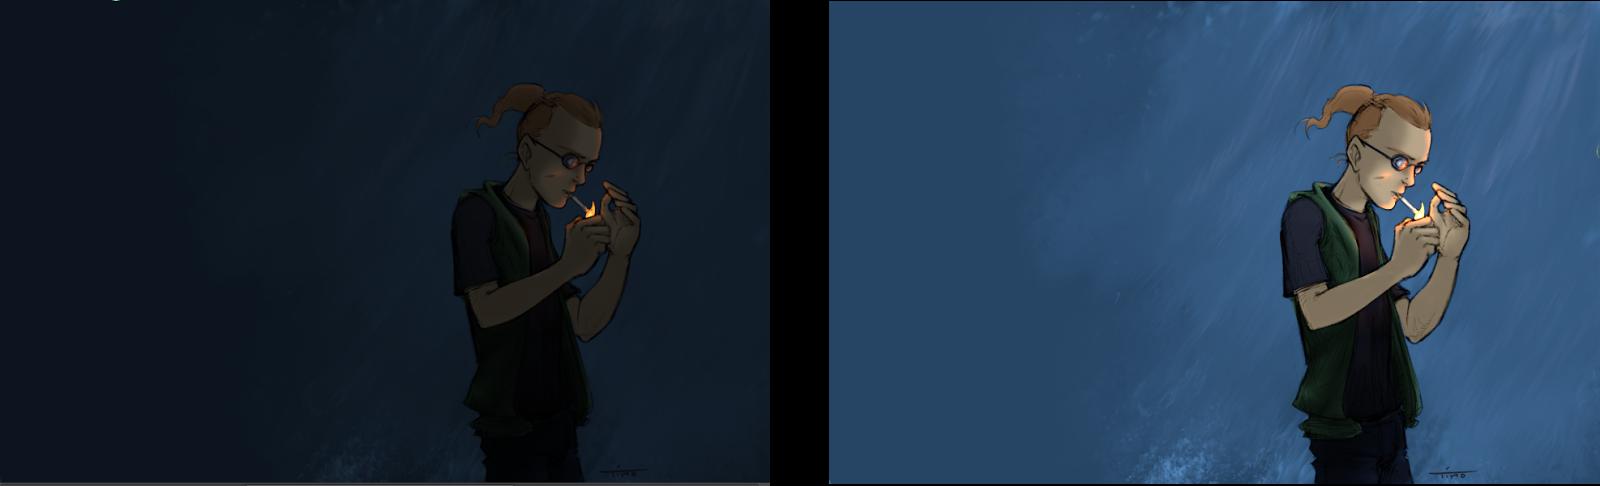 smoking_common.png